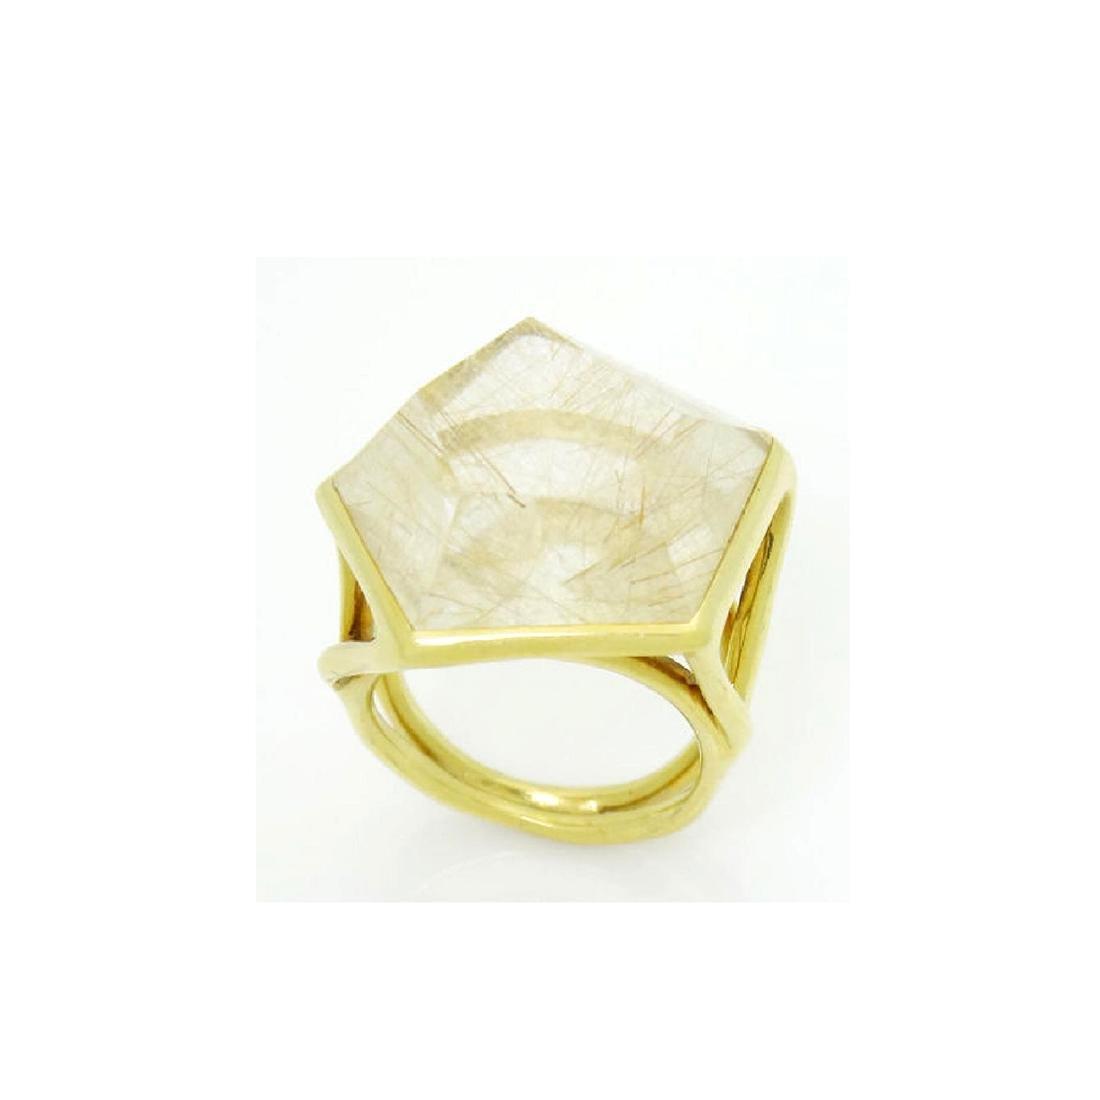 Ippolita 18k Yellow Gold & Large Quartz Rock Candy